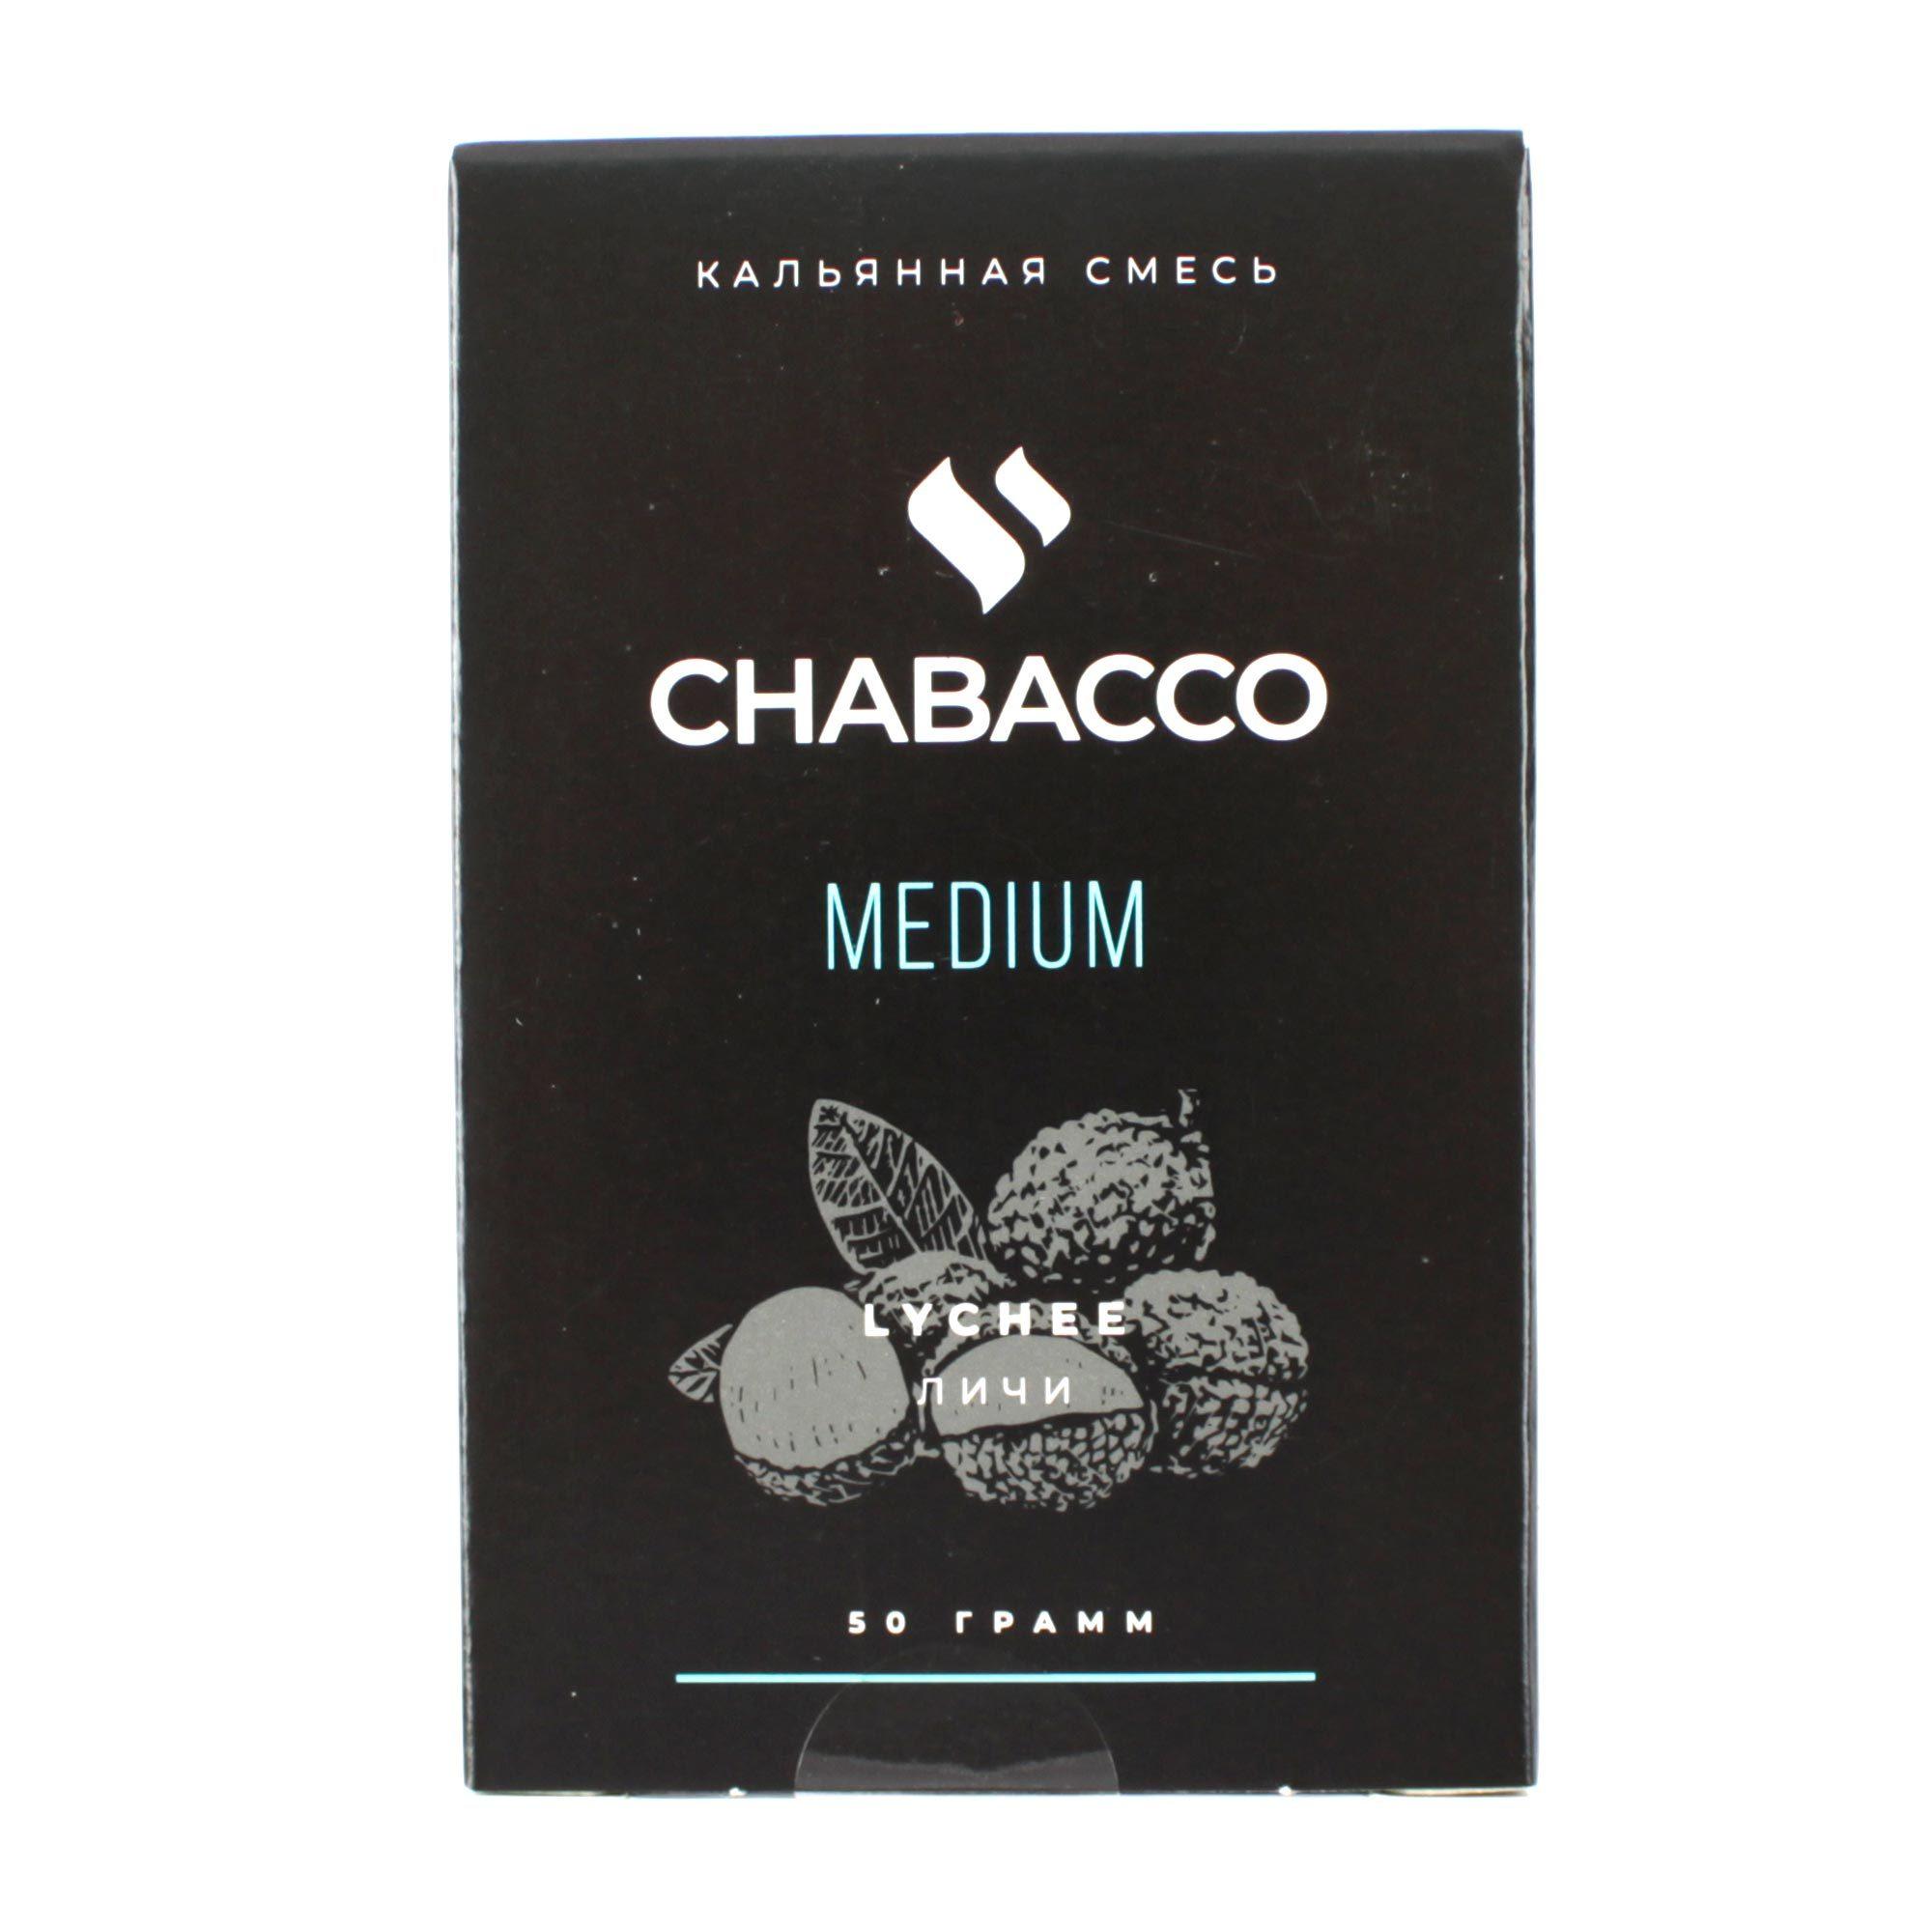 Кальянная смесь Chabacco Medium 50 гр Lychee Bisque